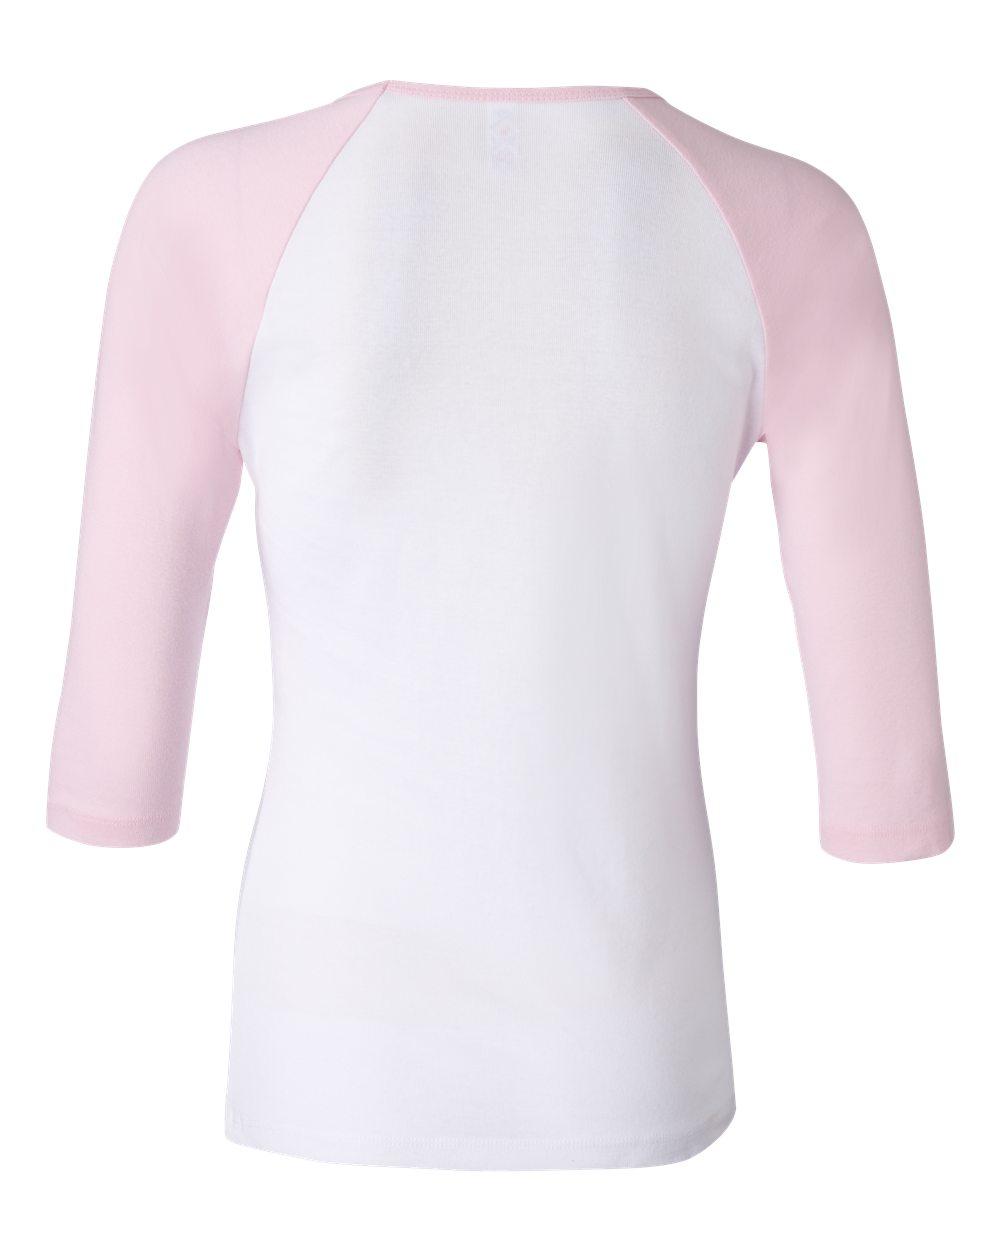 Bella-Canvas-Womens-Stretch-Rib-3-4-Sleeve-Contrast-Raglan-T-Shirt-B2000 thumbnail 23